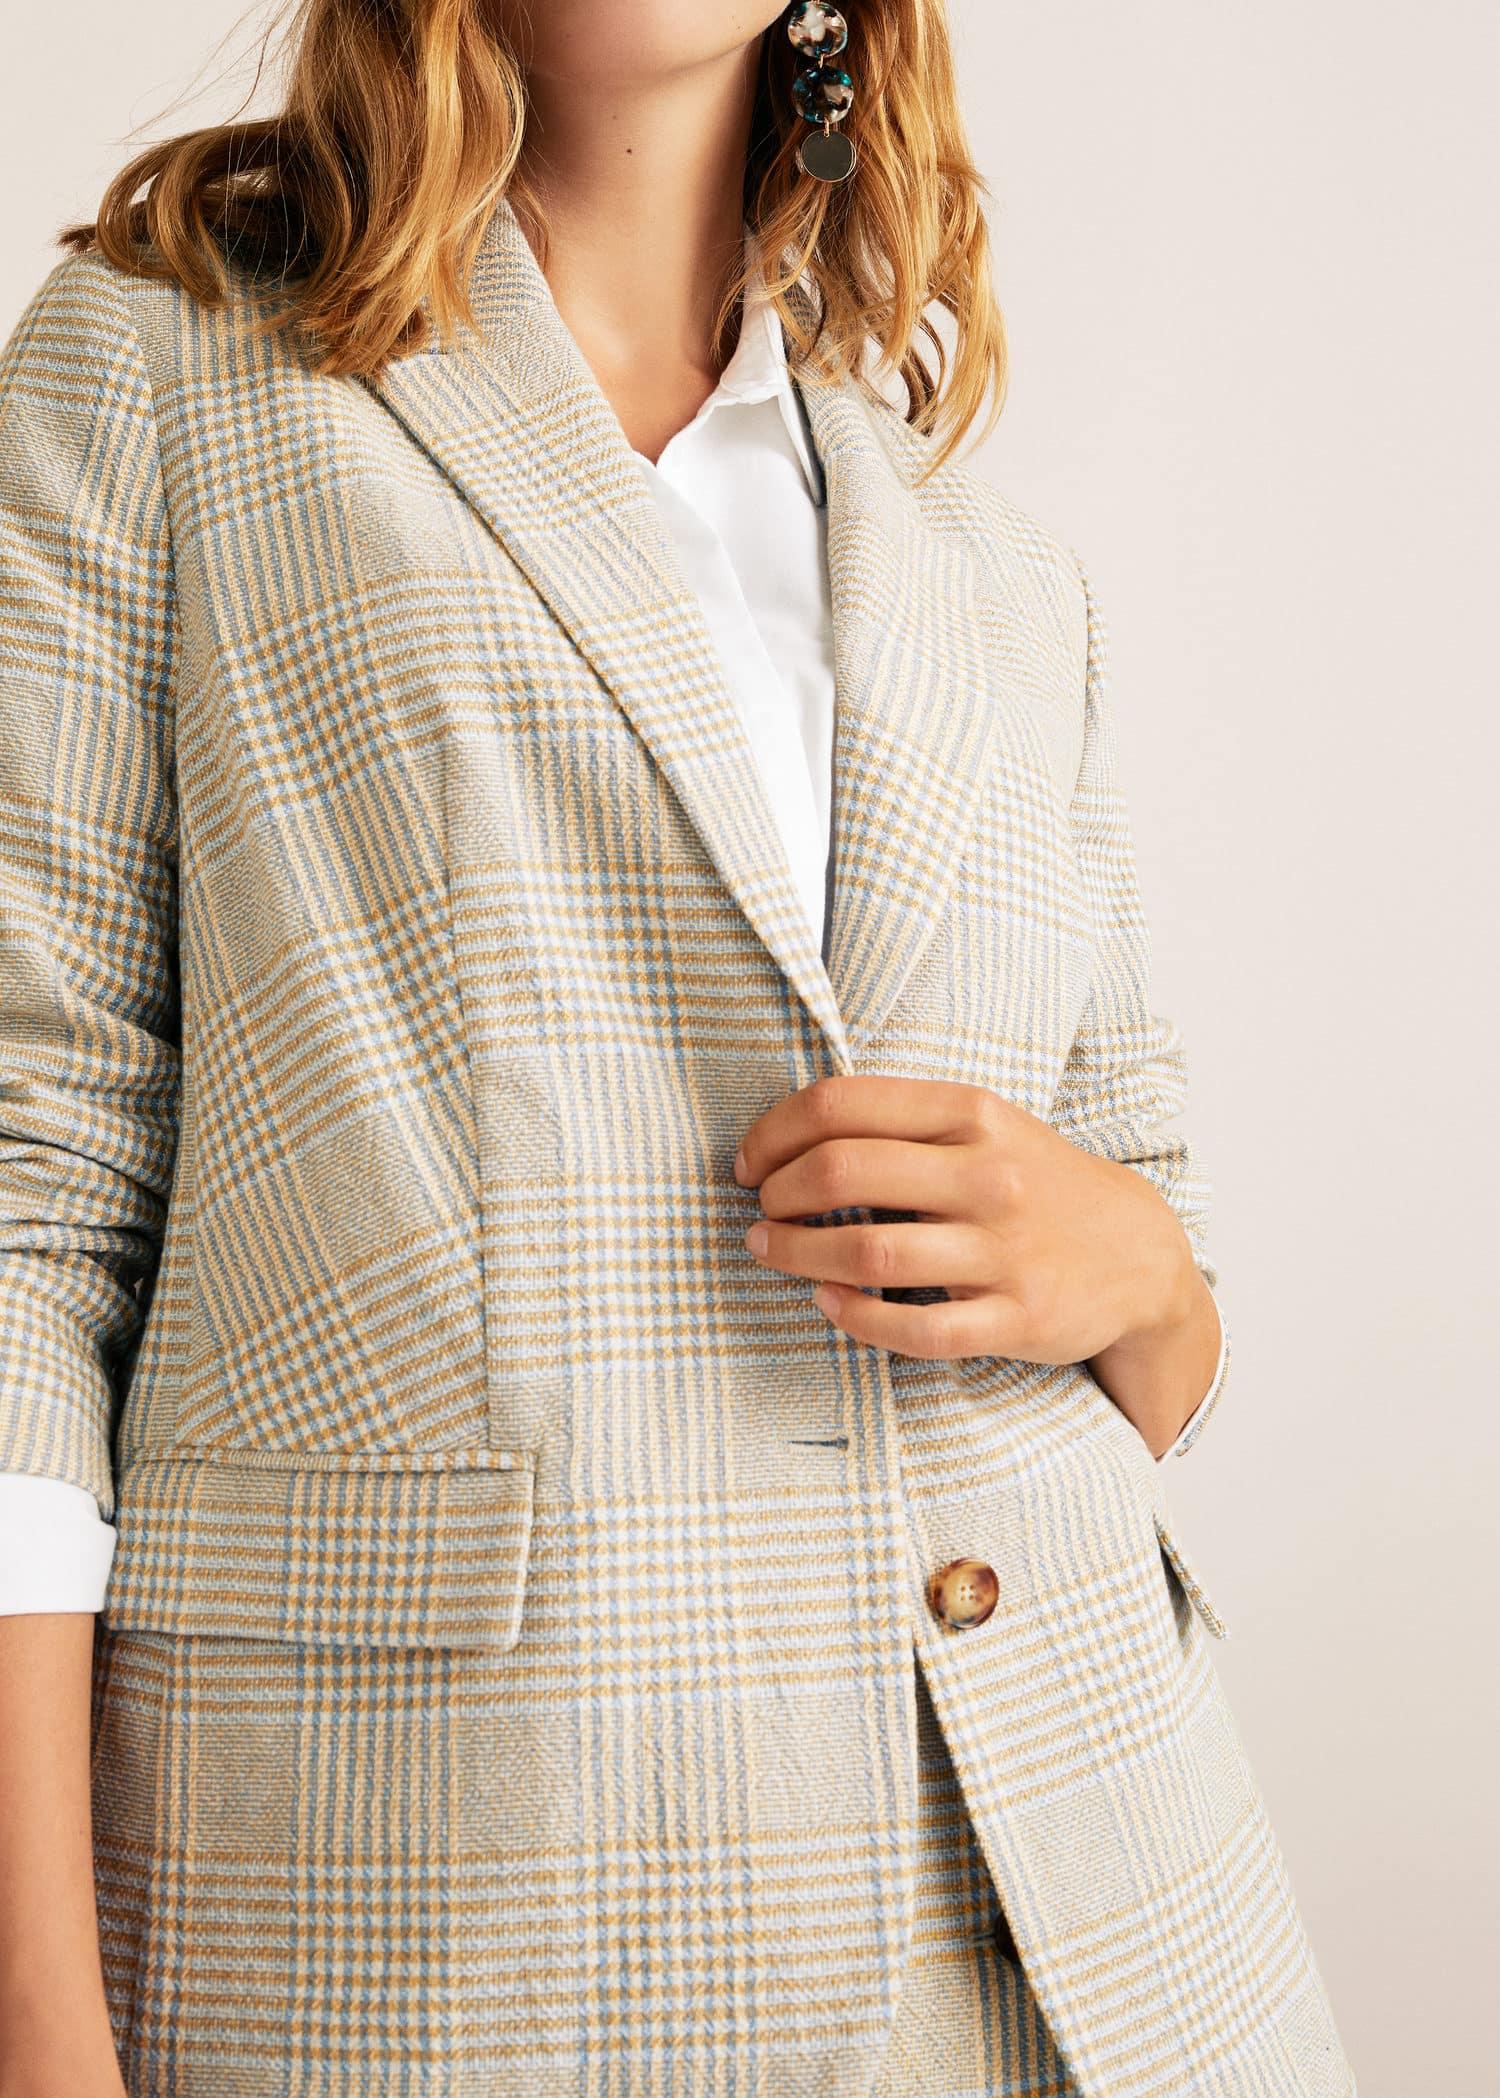 Blusa Textura Botones Camisas De Mujer | Outlet España from Mango Outlet on 21 Buttons